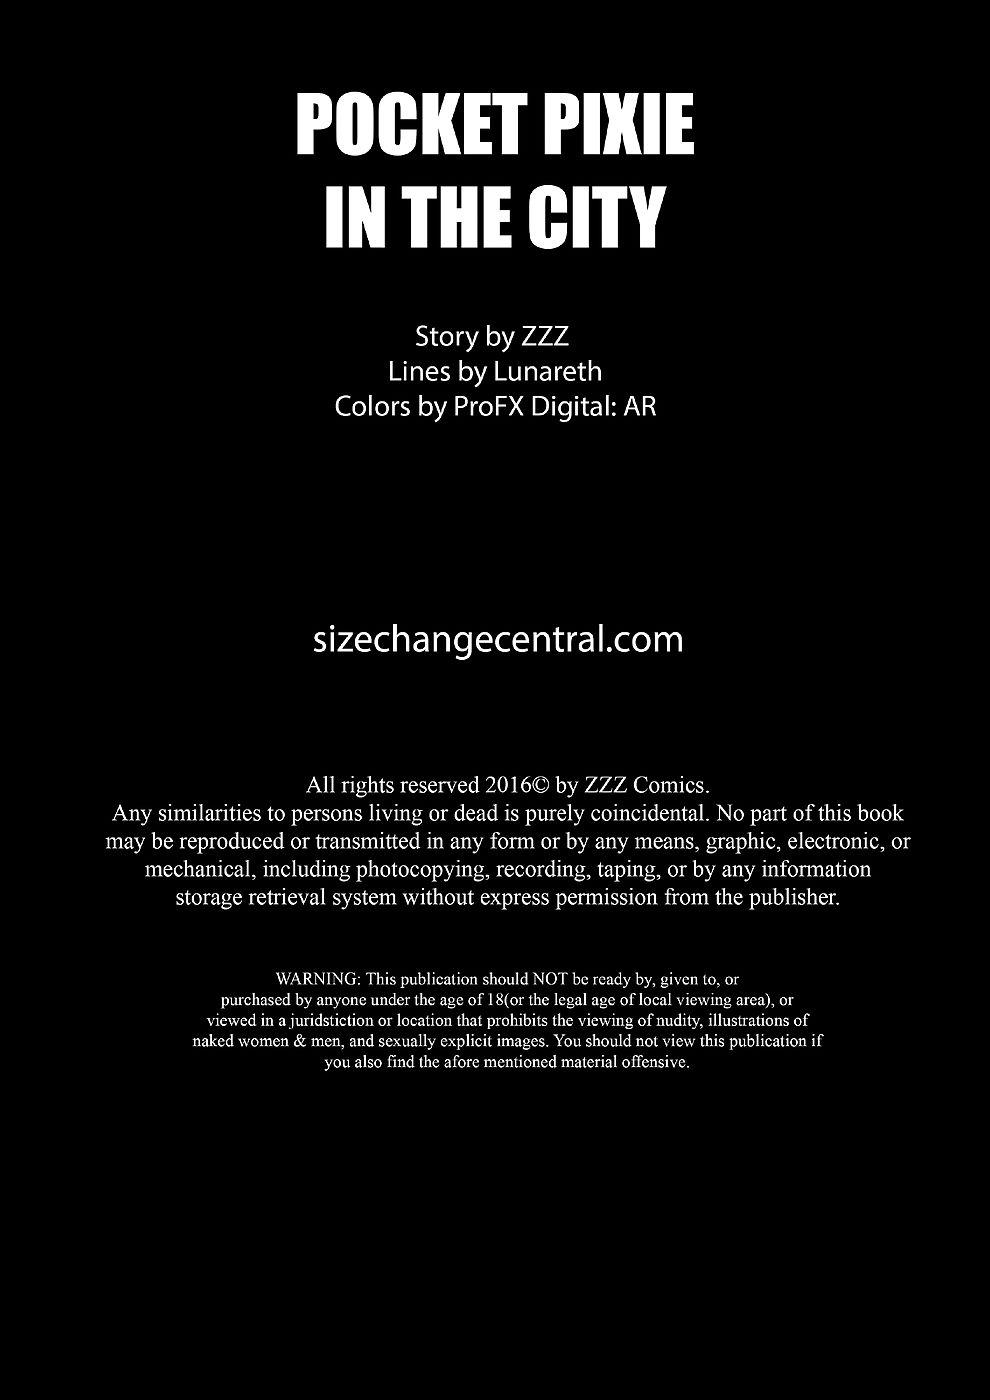 Pocket Pixie in the City CE- ZZZ